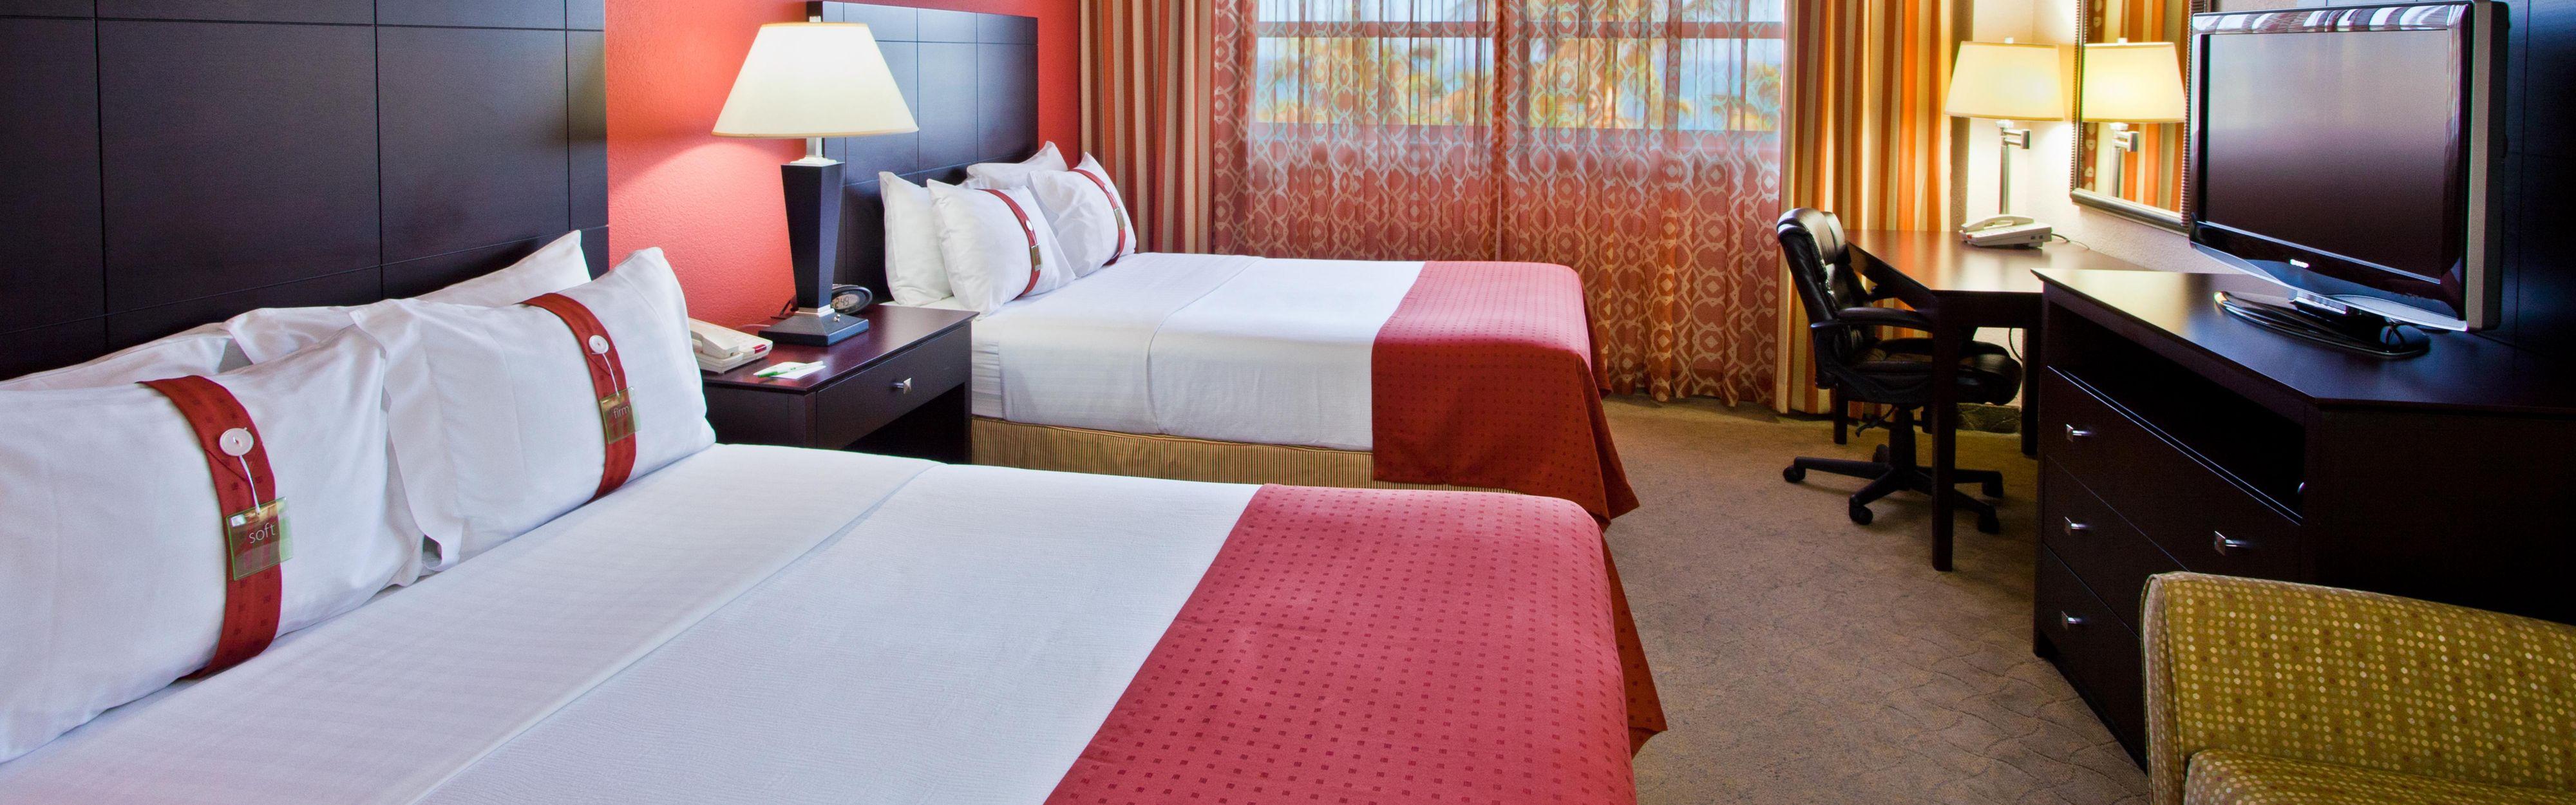 Holiday Inn Miami Beach-Oceanfront image 1